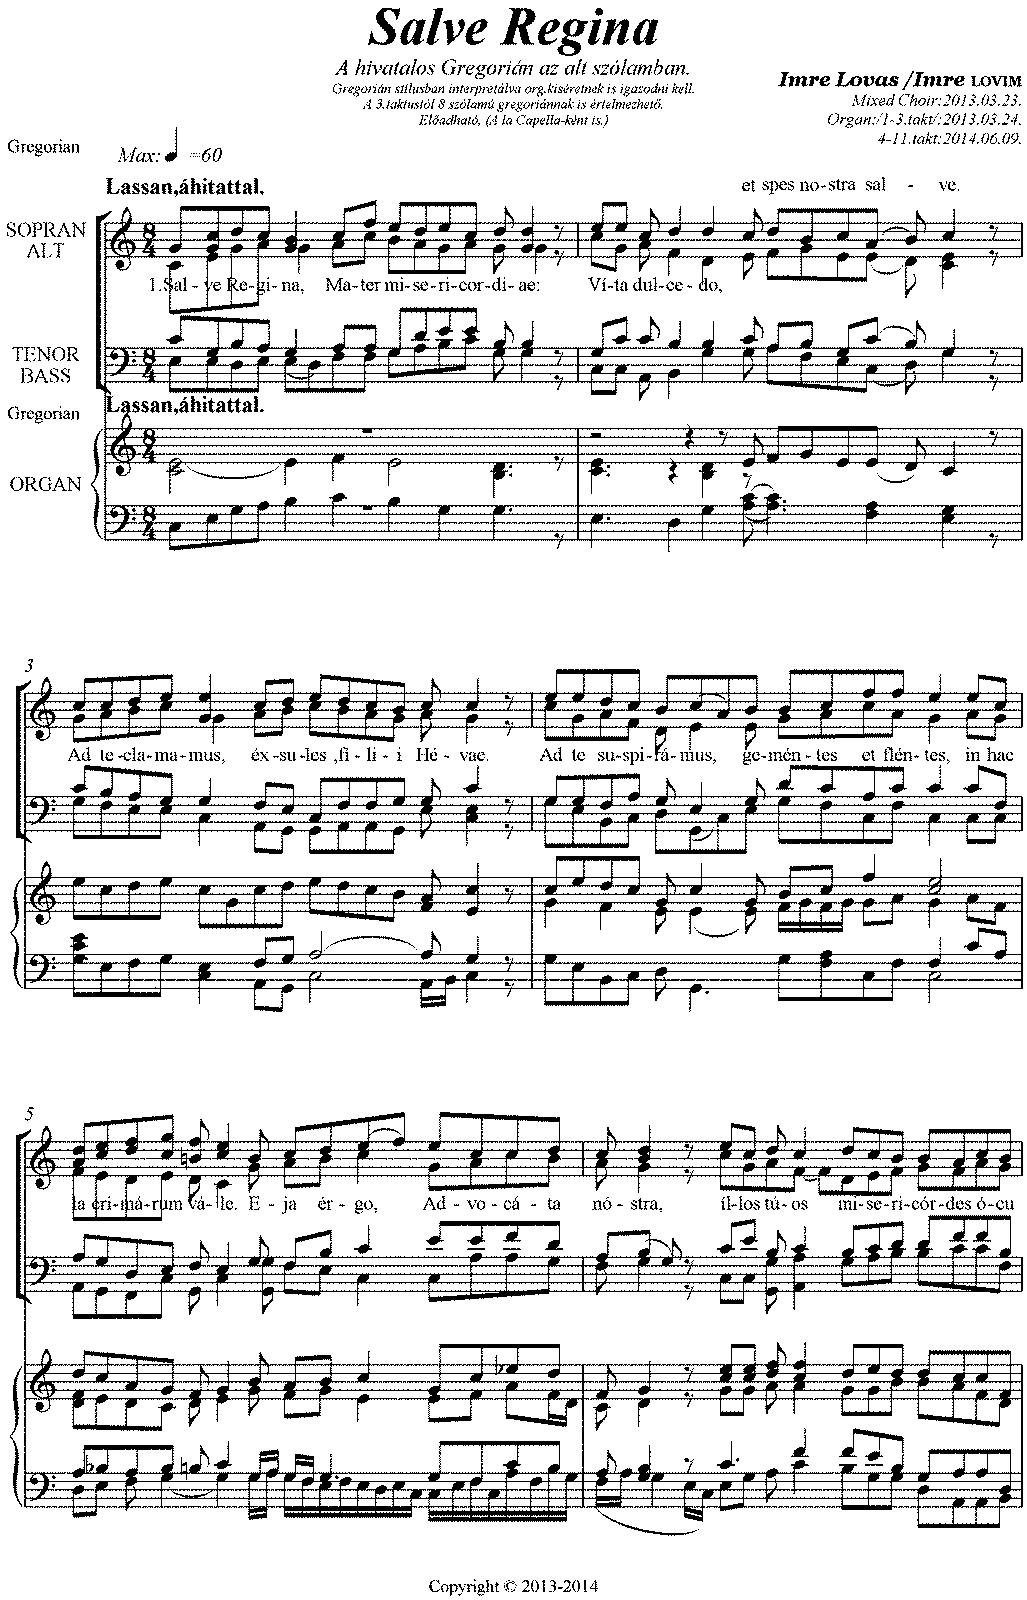 salve regina  lovas  imre   petrucci music library